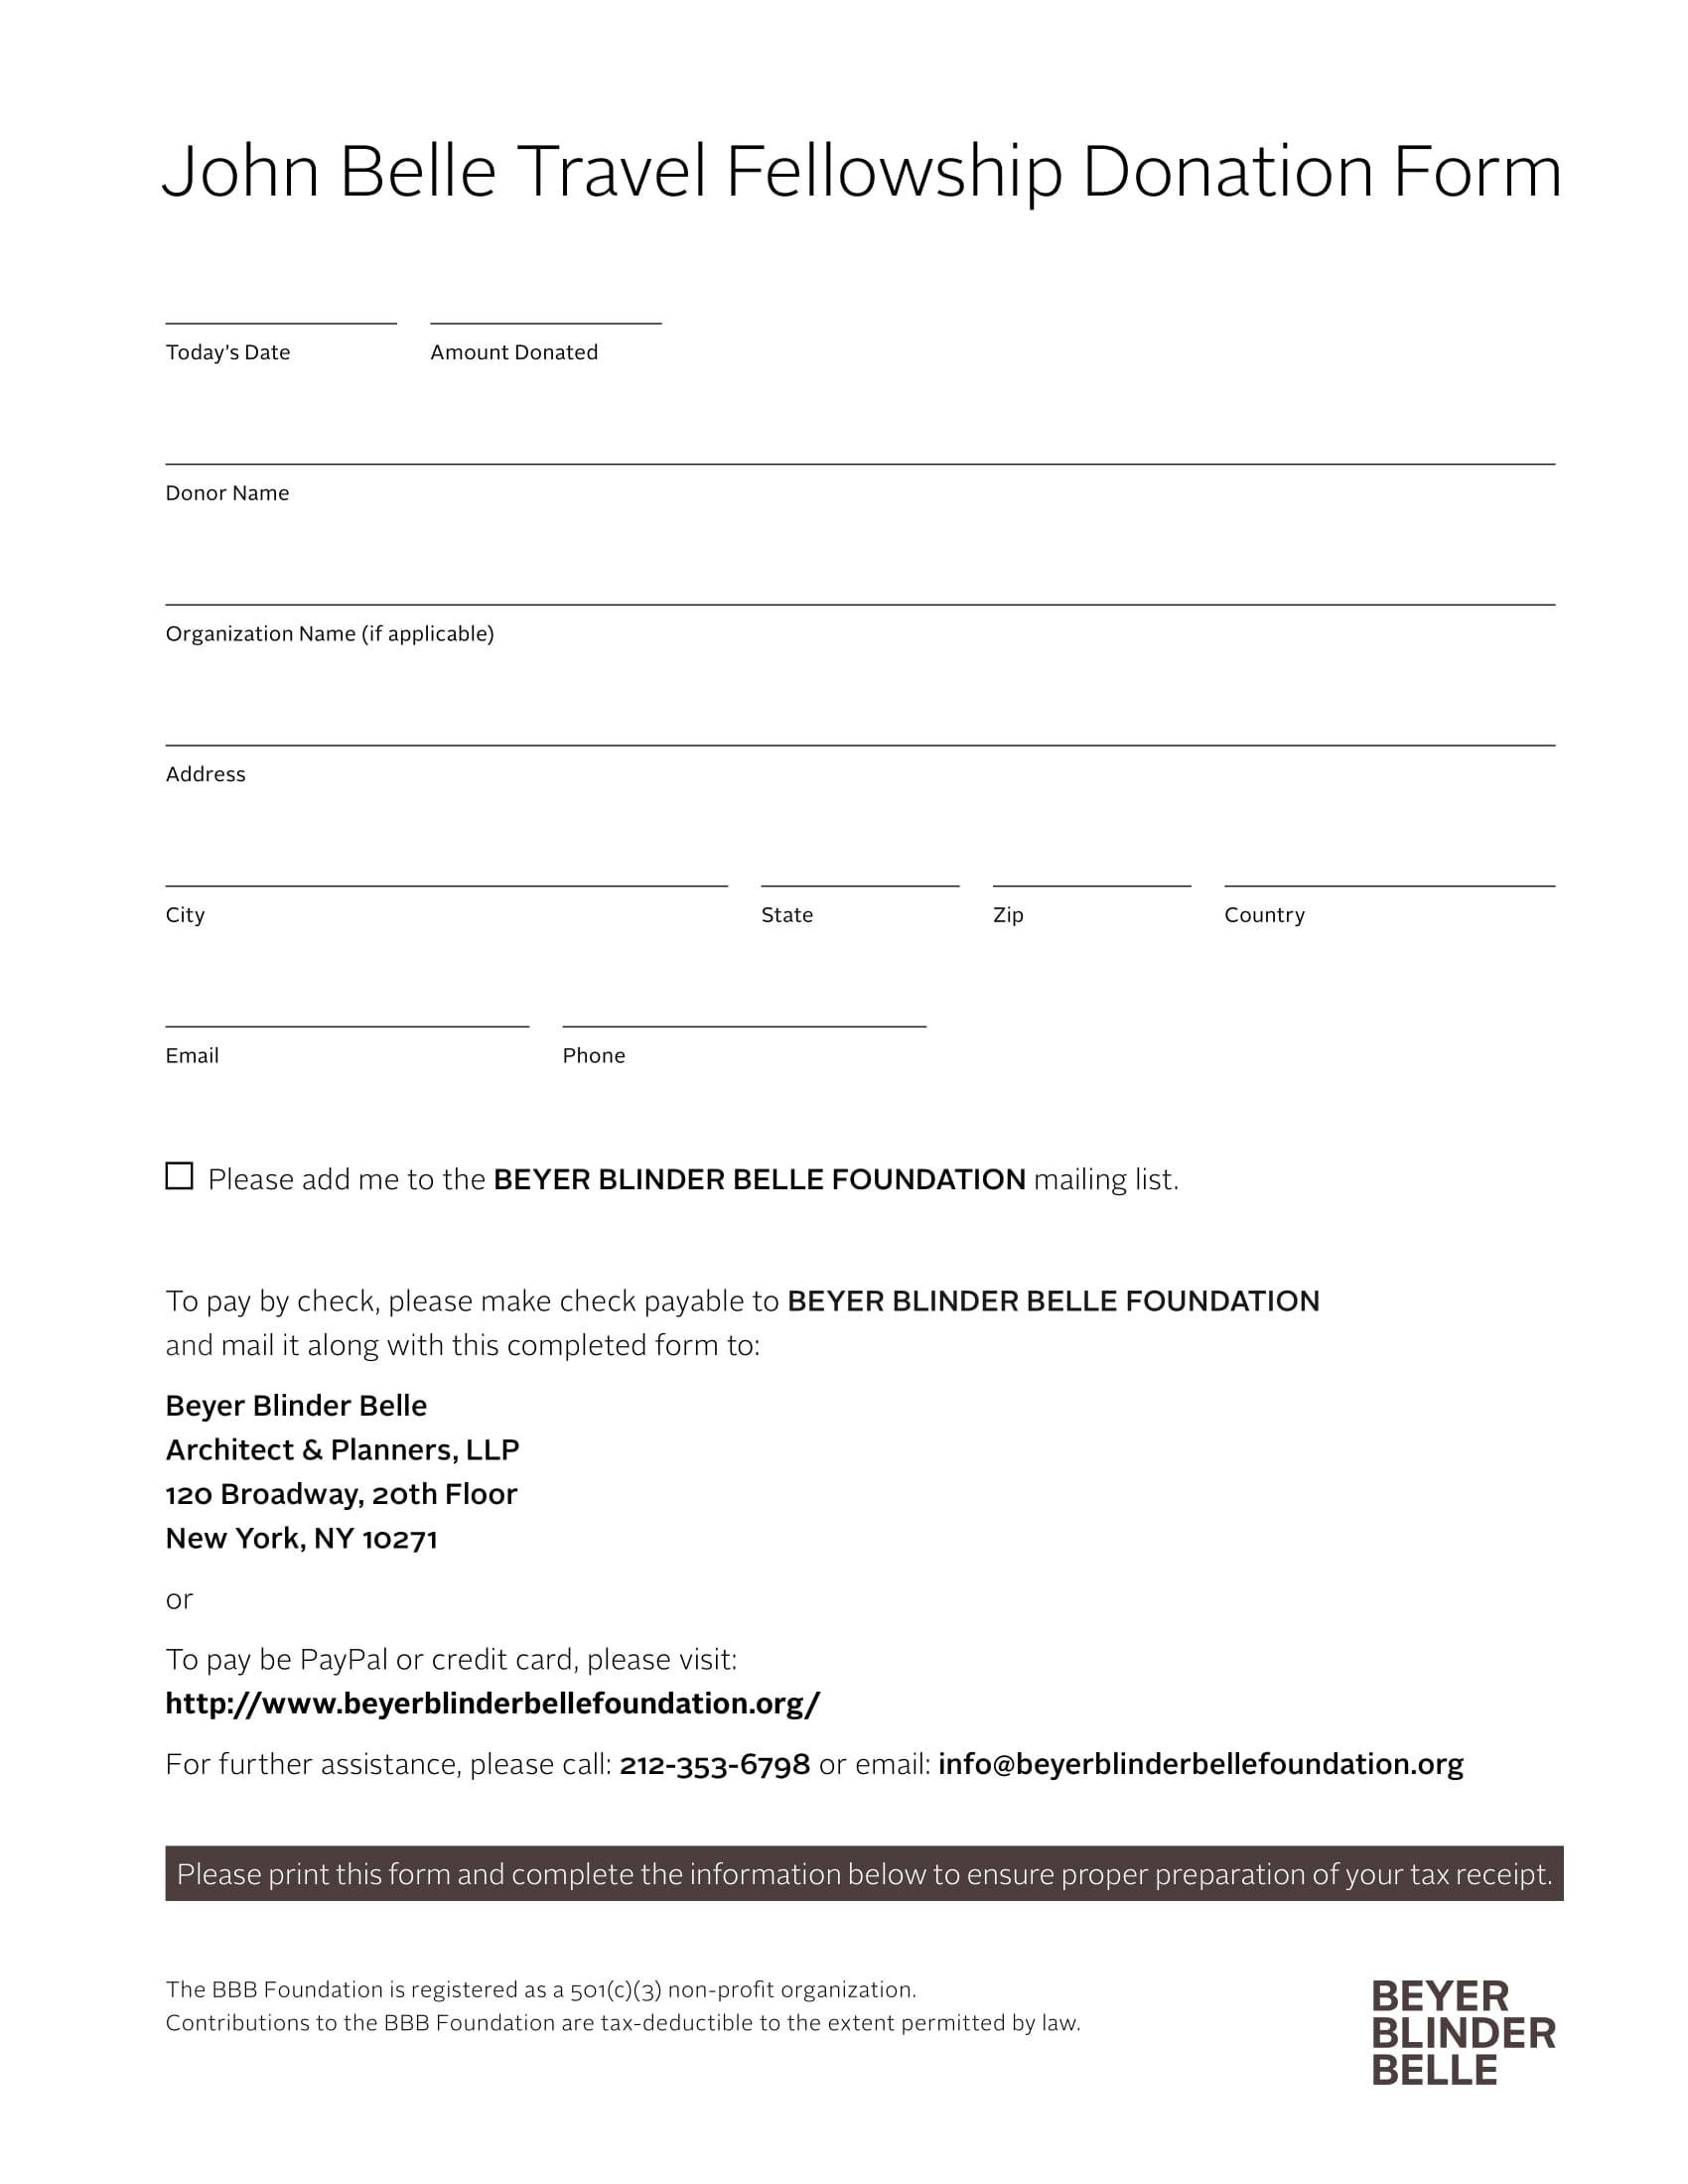 travel fellowship donation form 1